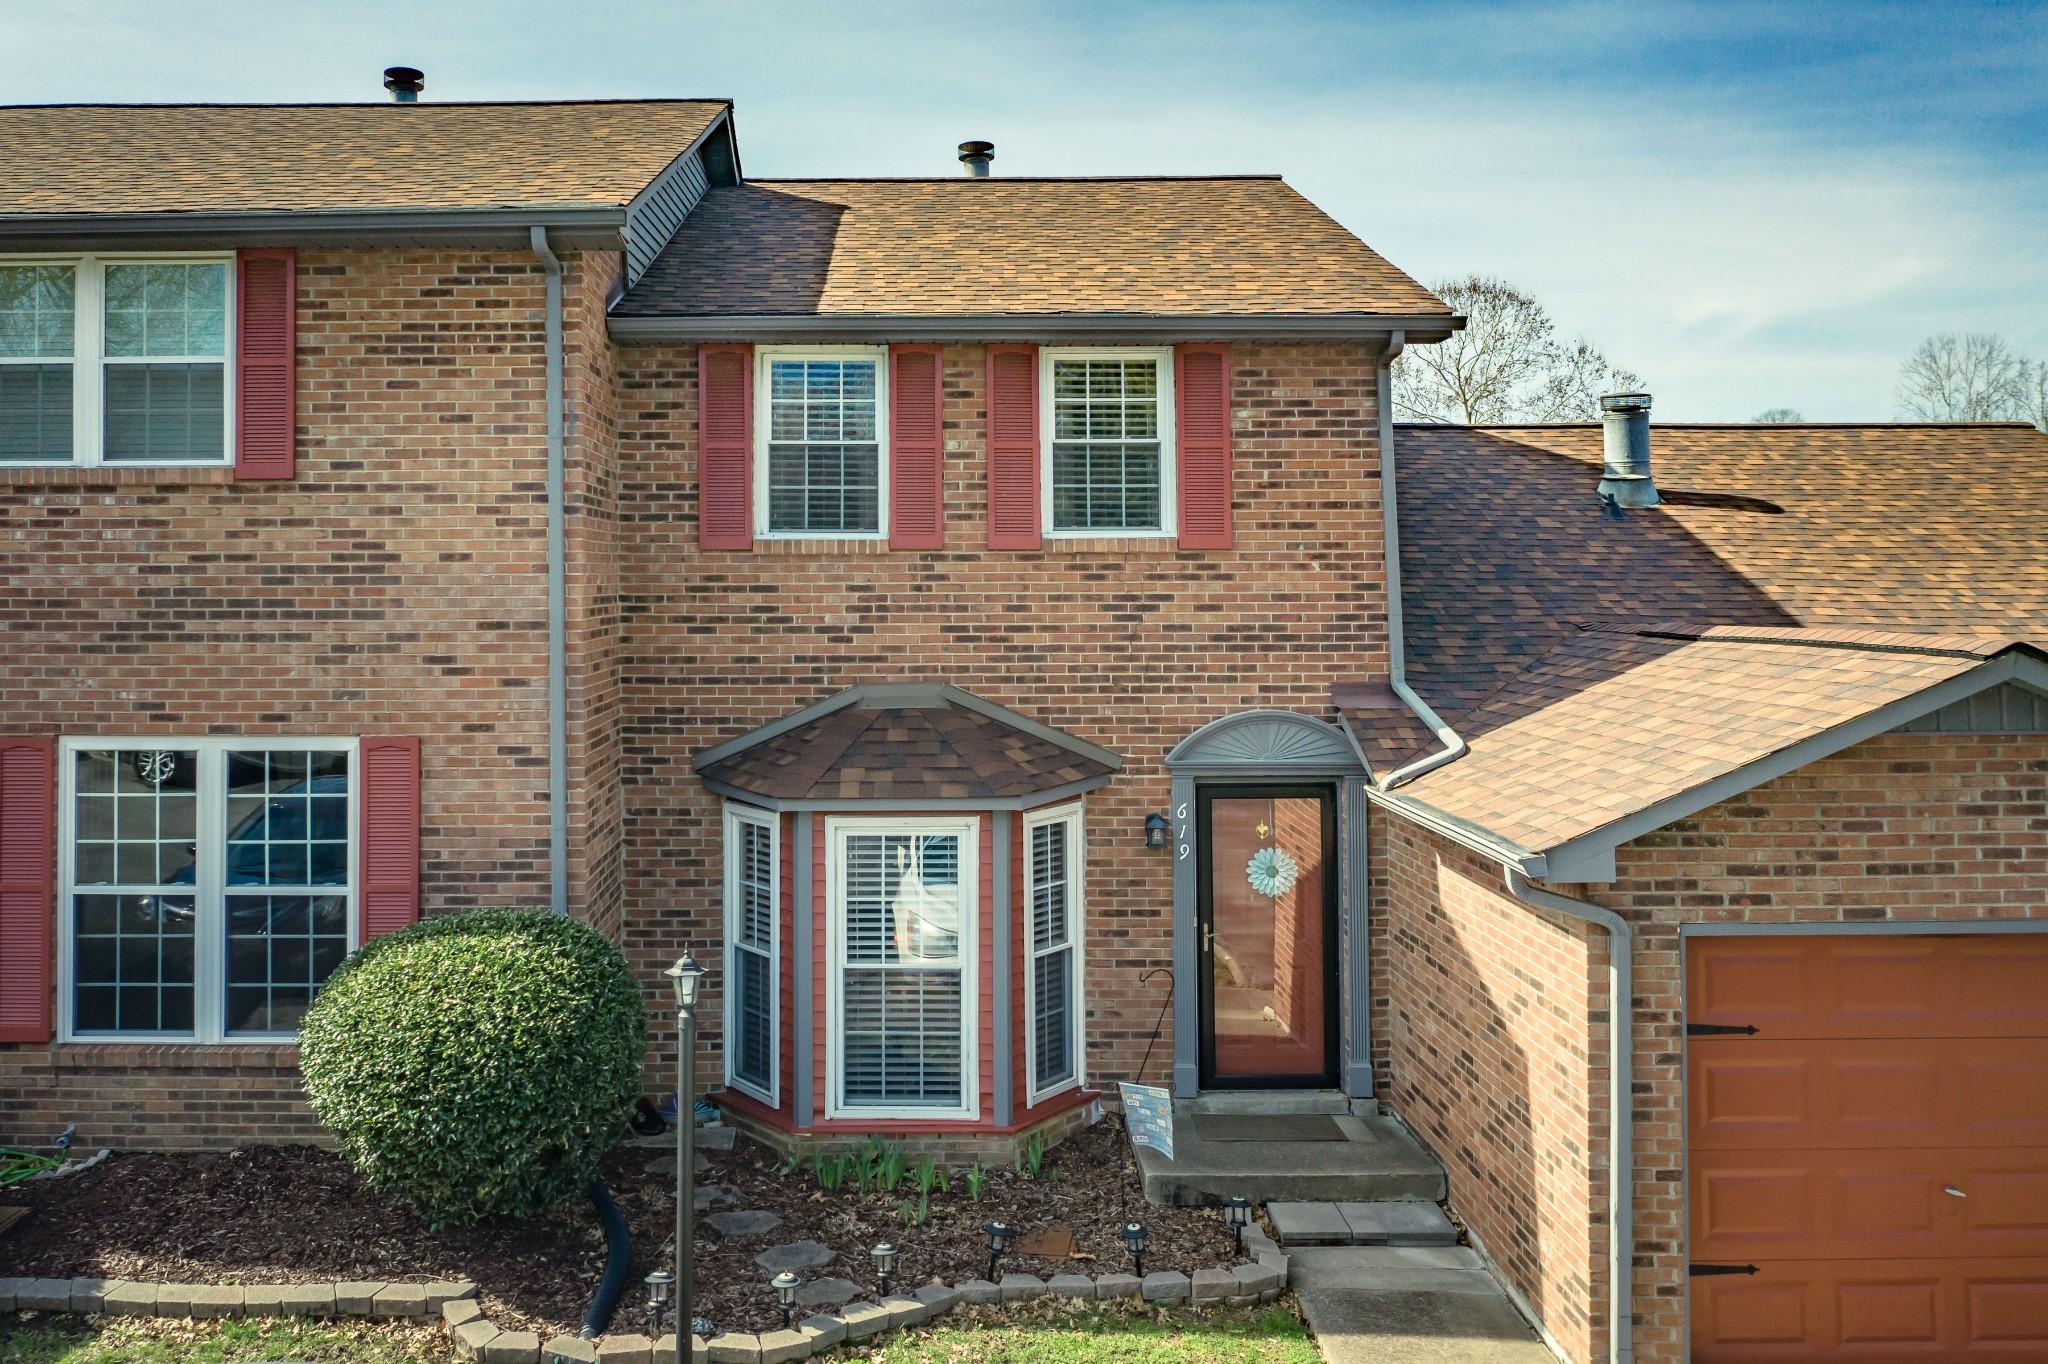 619 Hickory Glade Ct, Antioch, TN 37013 - Antioch, TN real estate listing